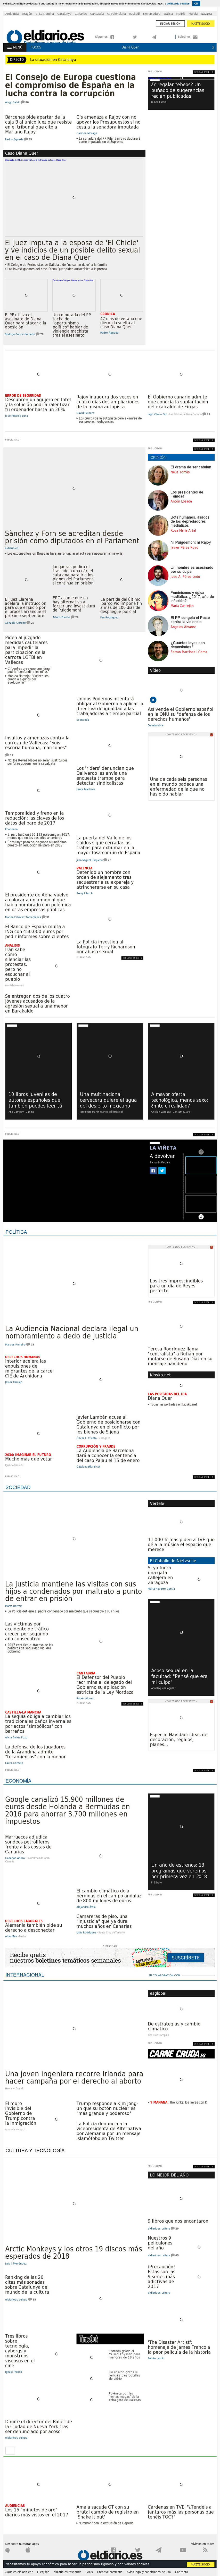 El Diario at Wednesday Jan. 3, 2018, 7:03 p.m. UTC